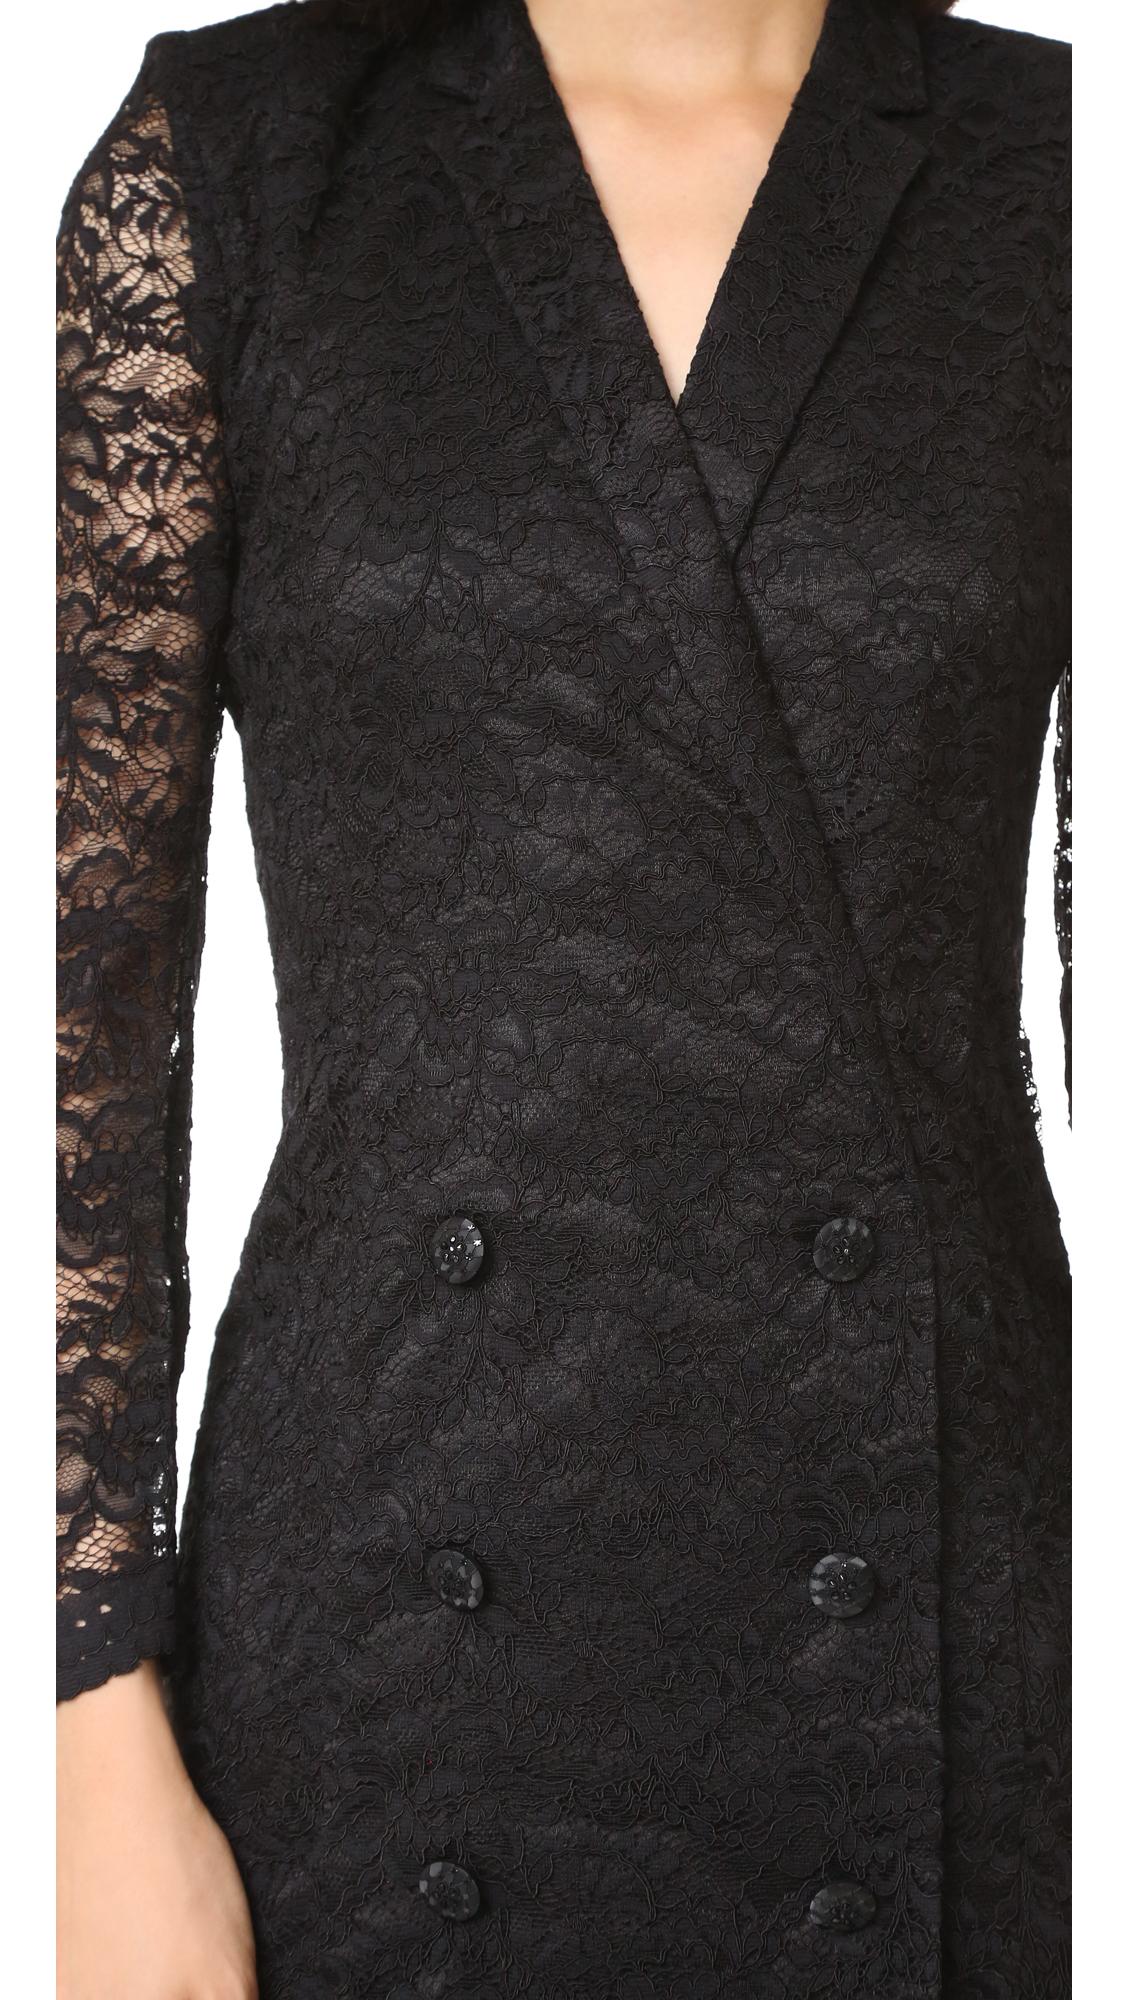 044f22f38b The Kooples Lace Wrap Jacket Dress | SHOPBOP